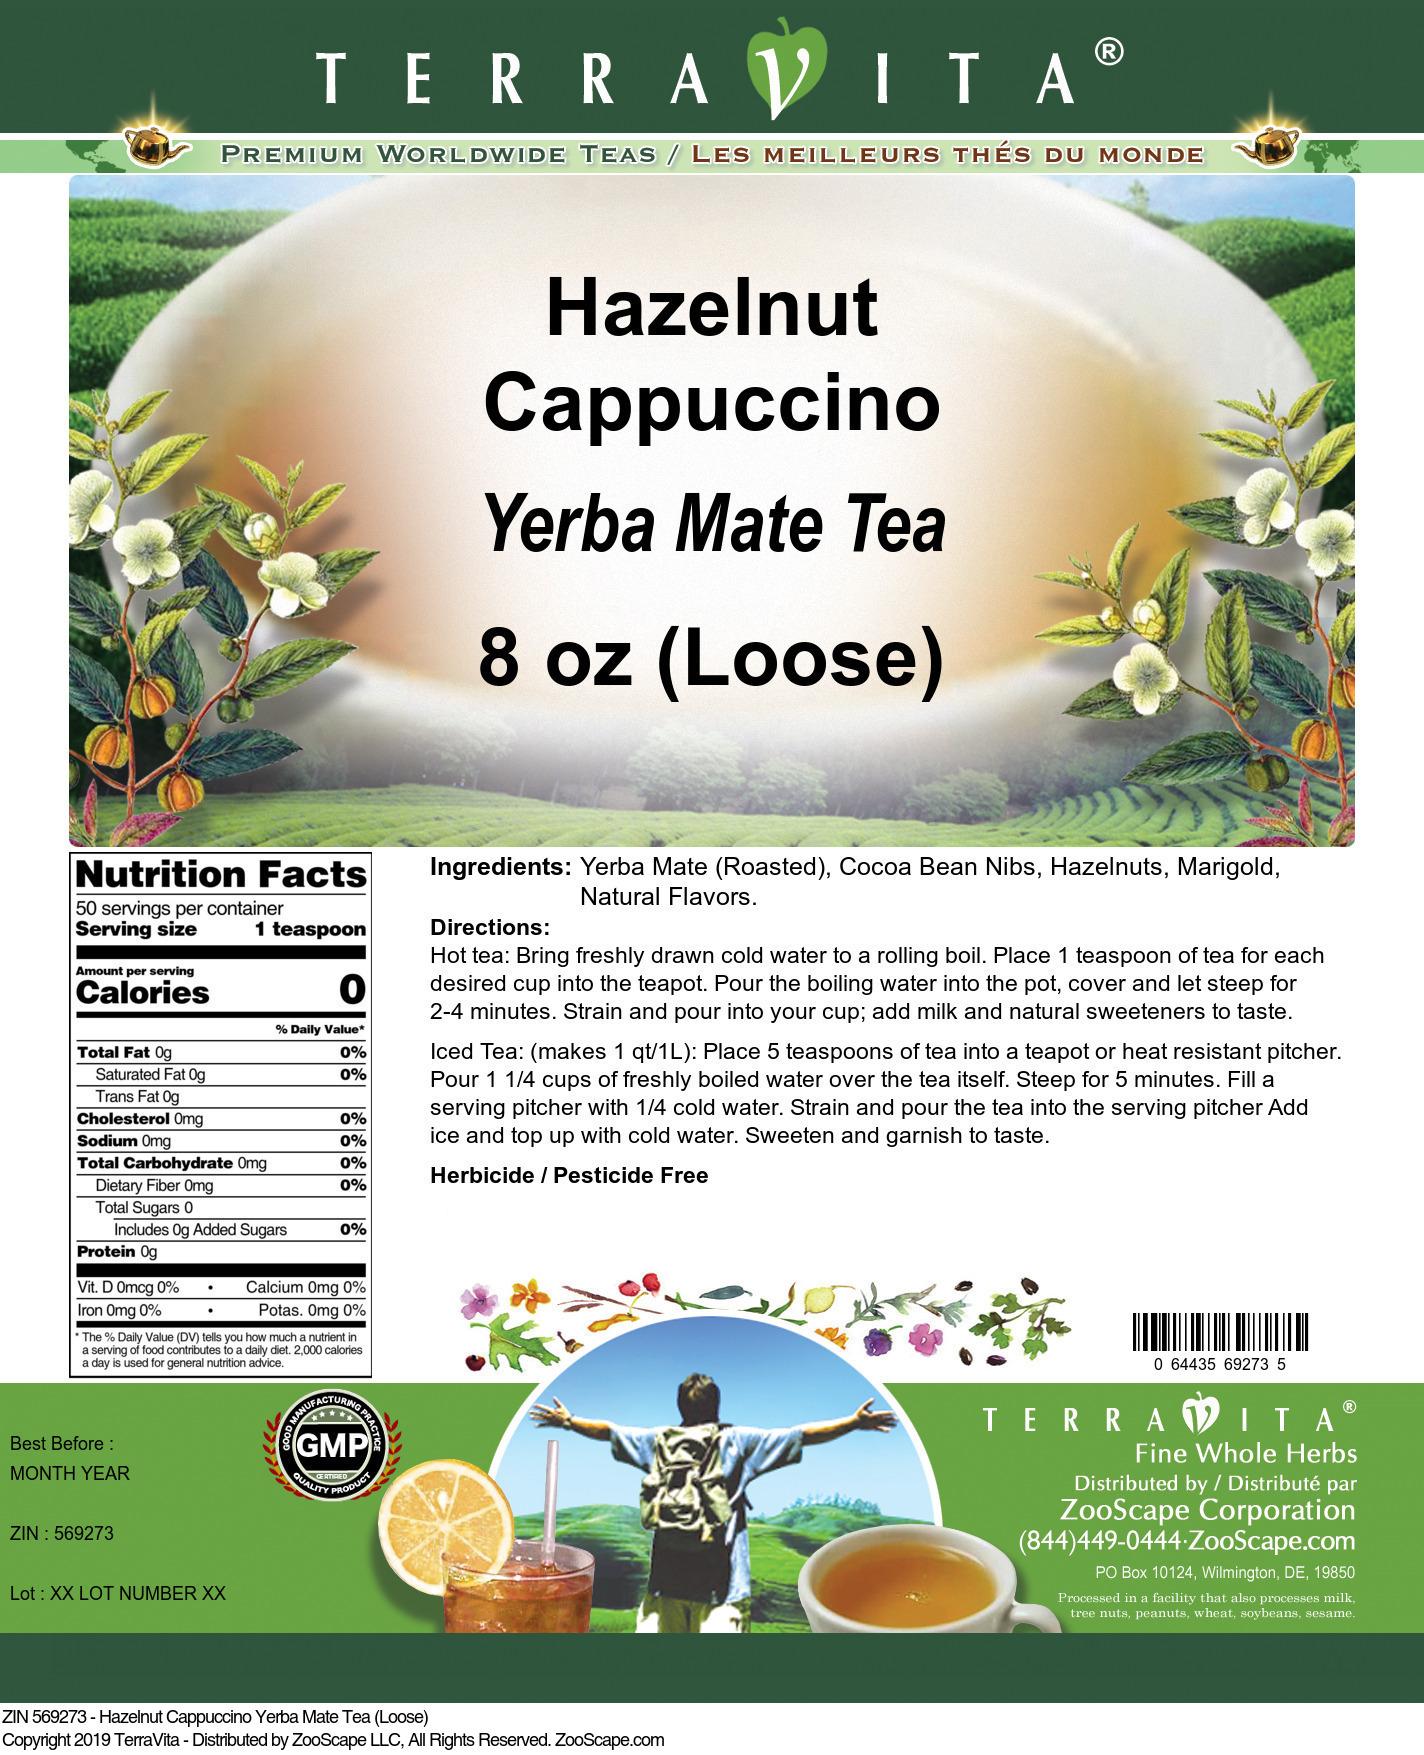 Hazelnut Cappuccino Yerba Mate Tea (Loose)